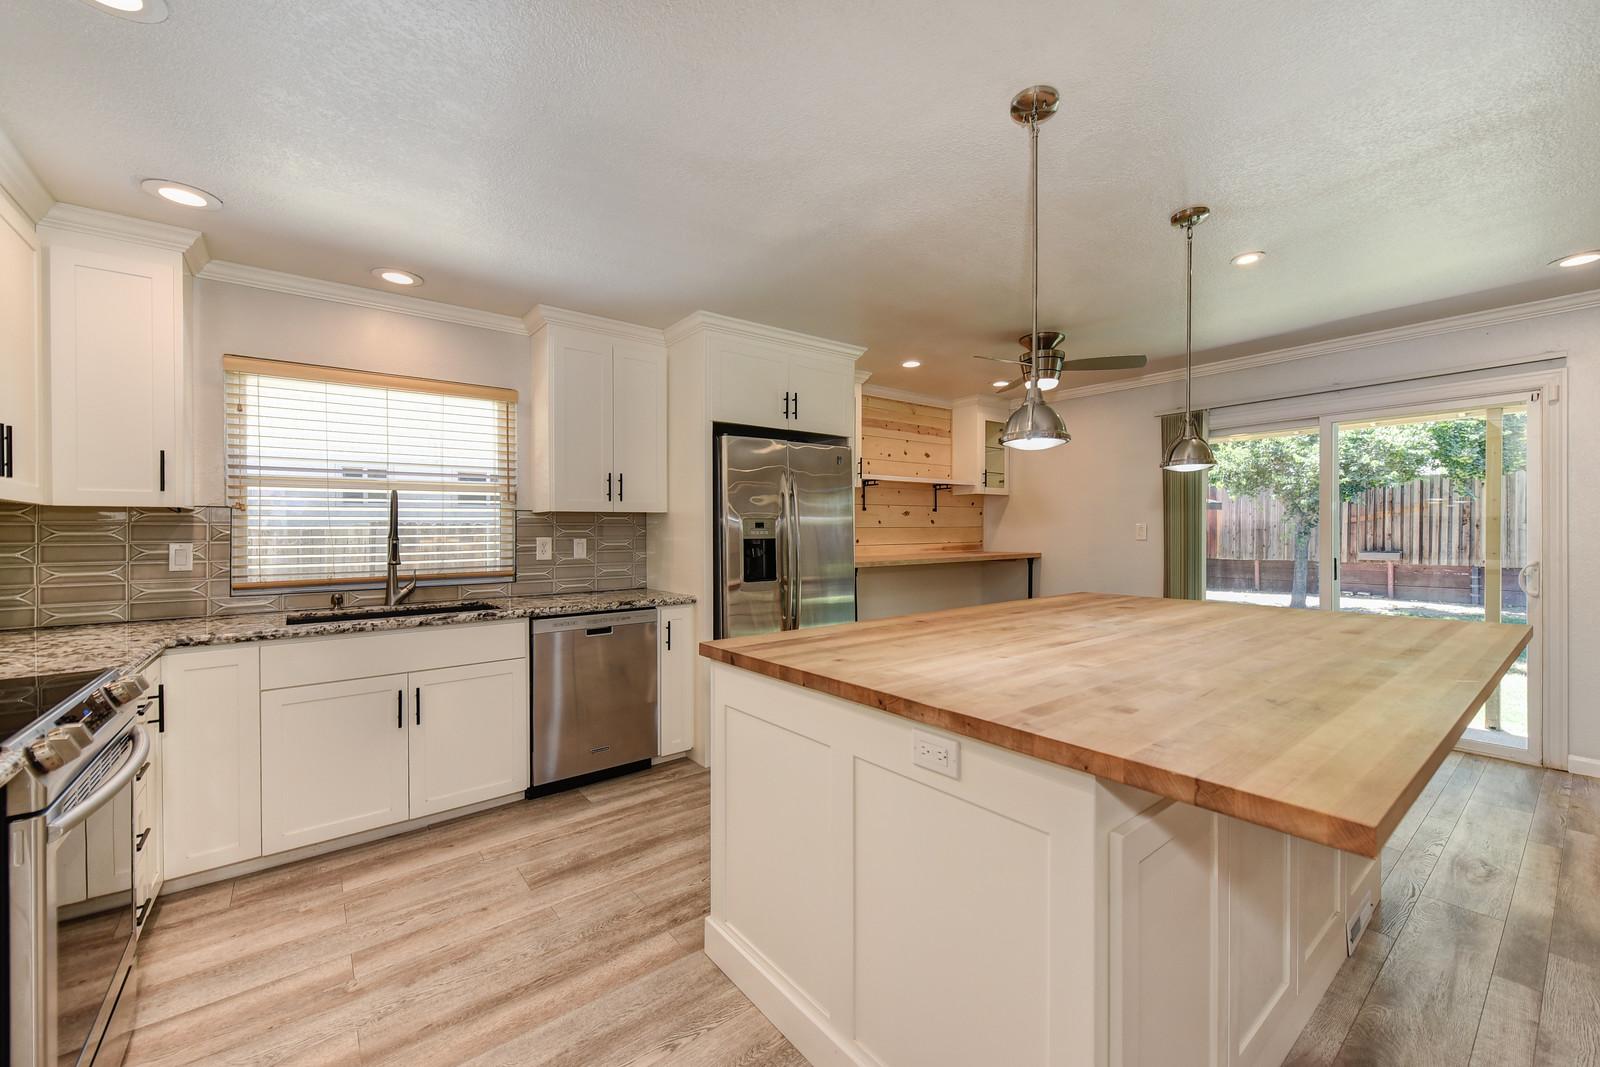 5342 Nyoda Way Carmichael Kitchen | Realtor in Carmichael California | Carmichael California homes for sale